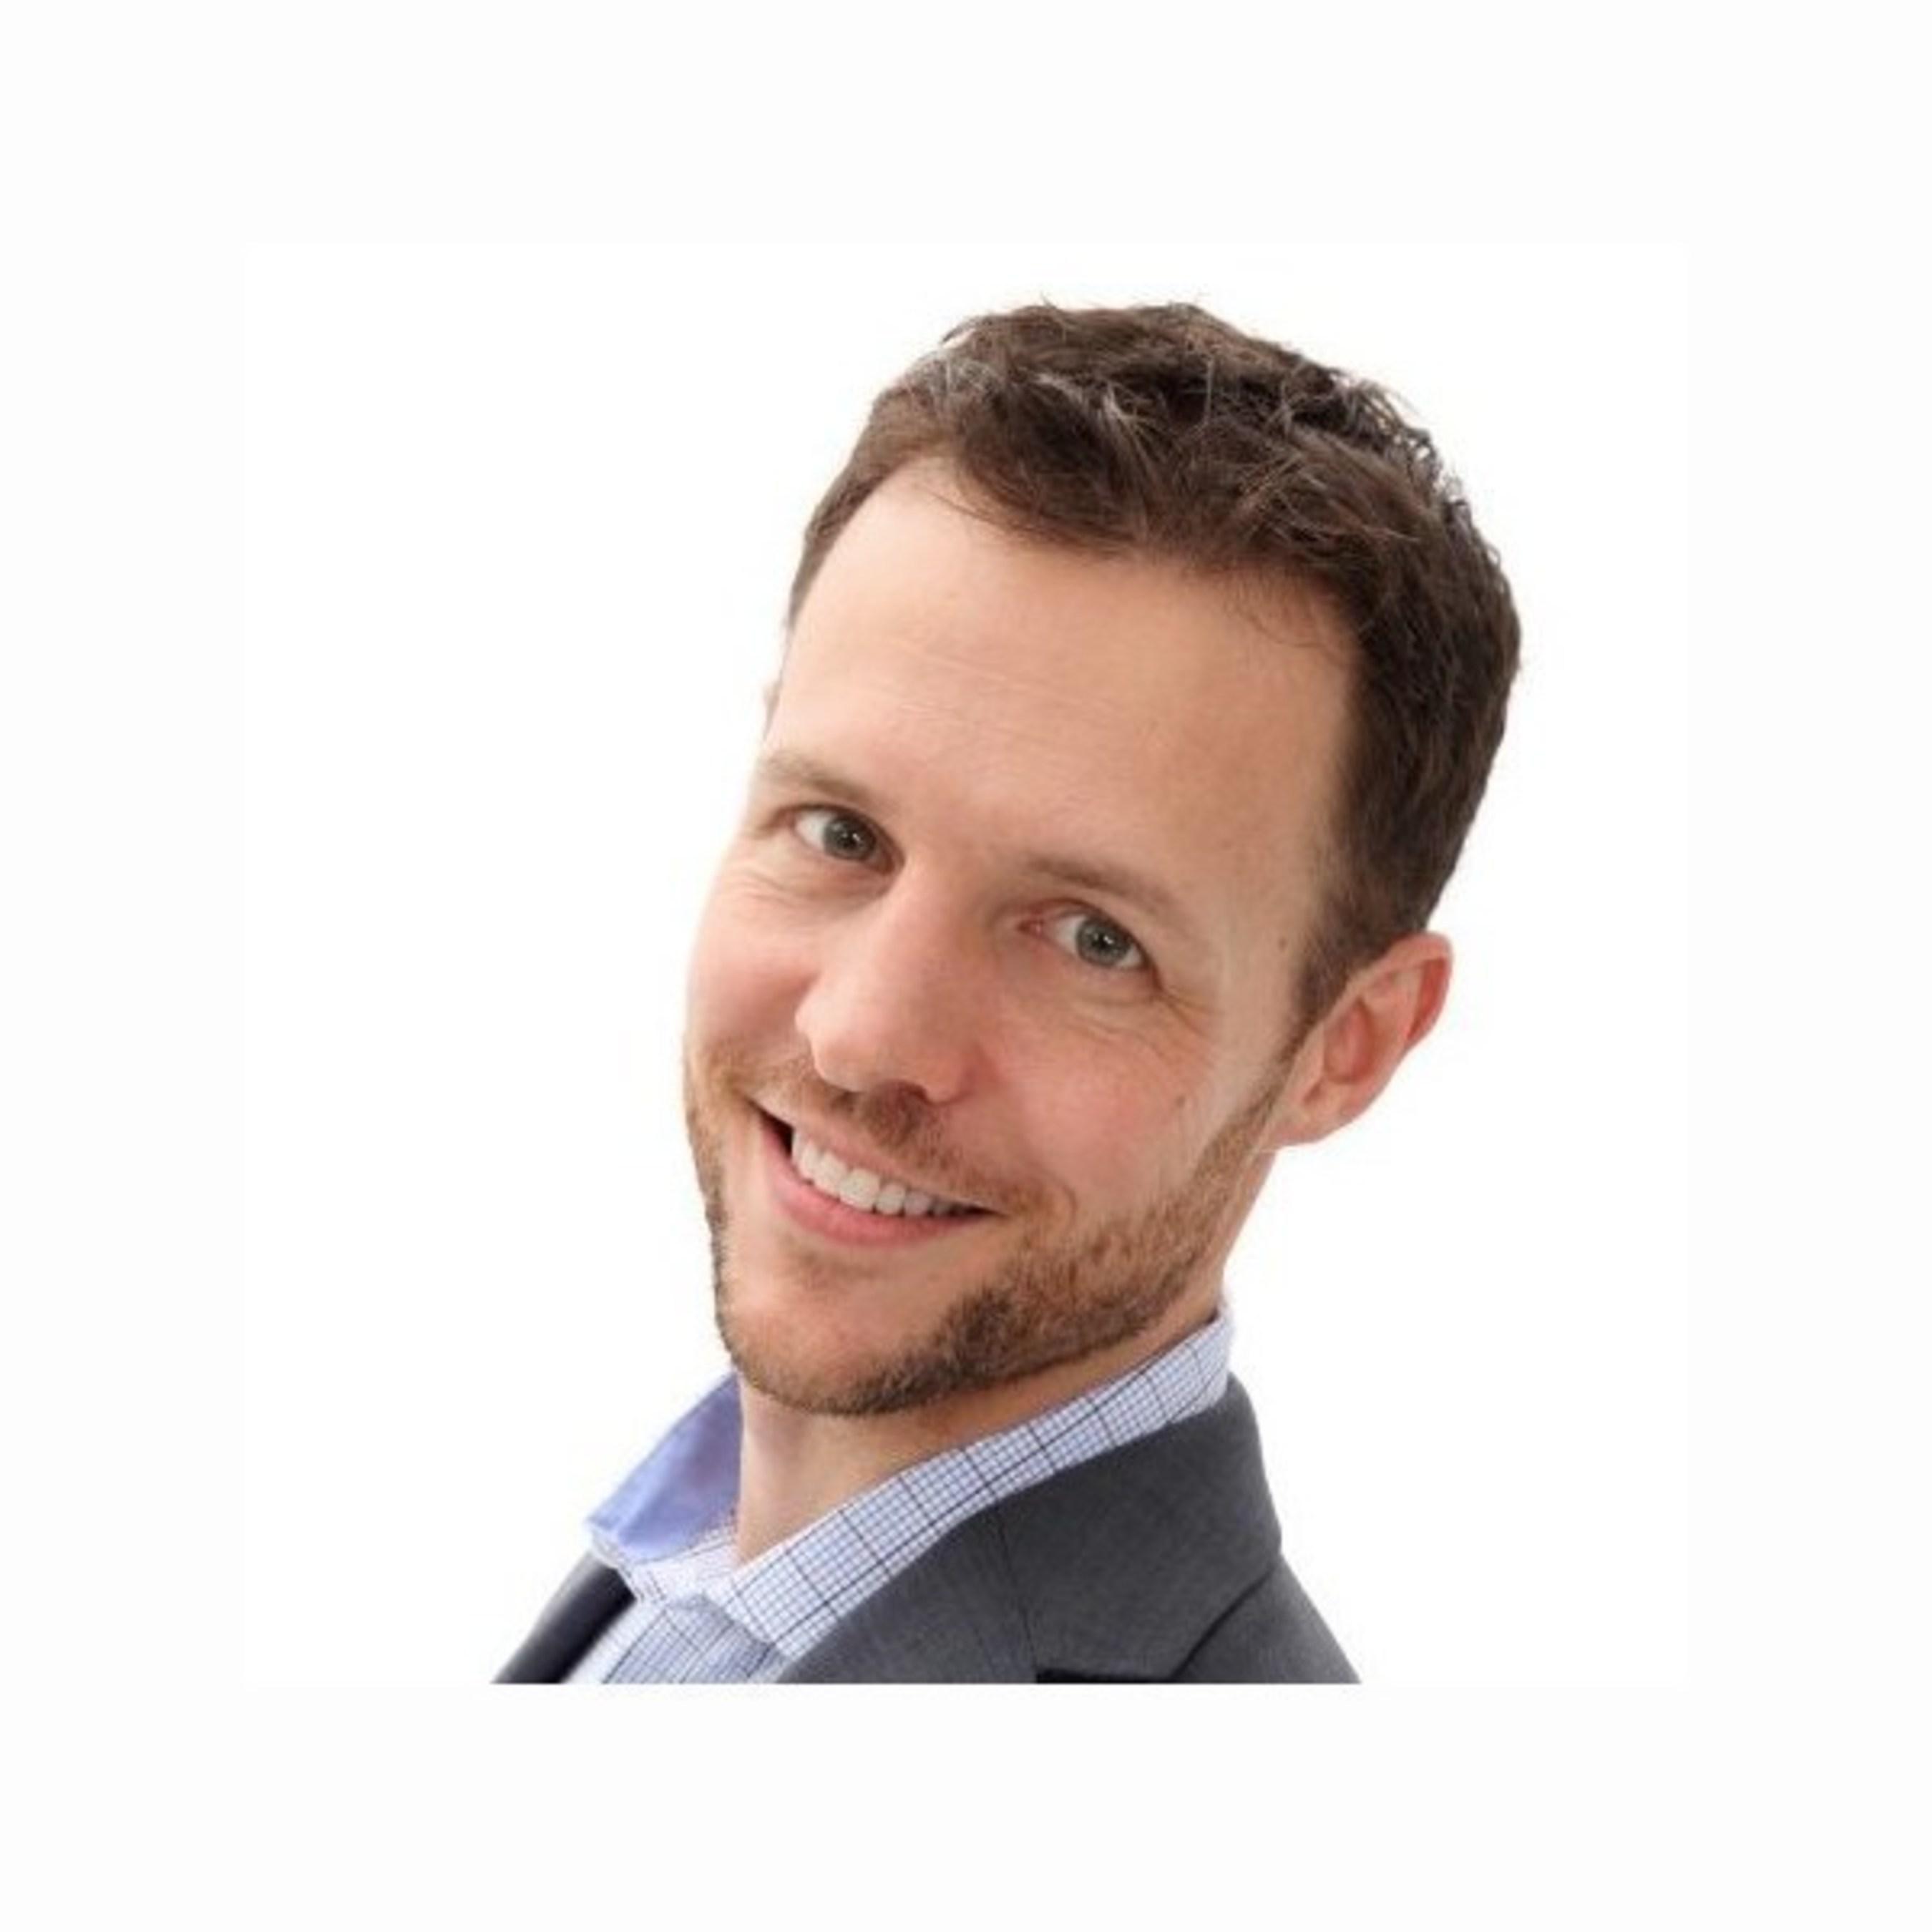 David Thomas, Director of Business Development